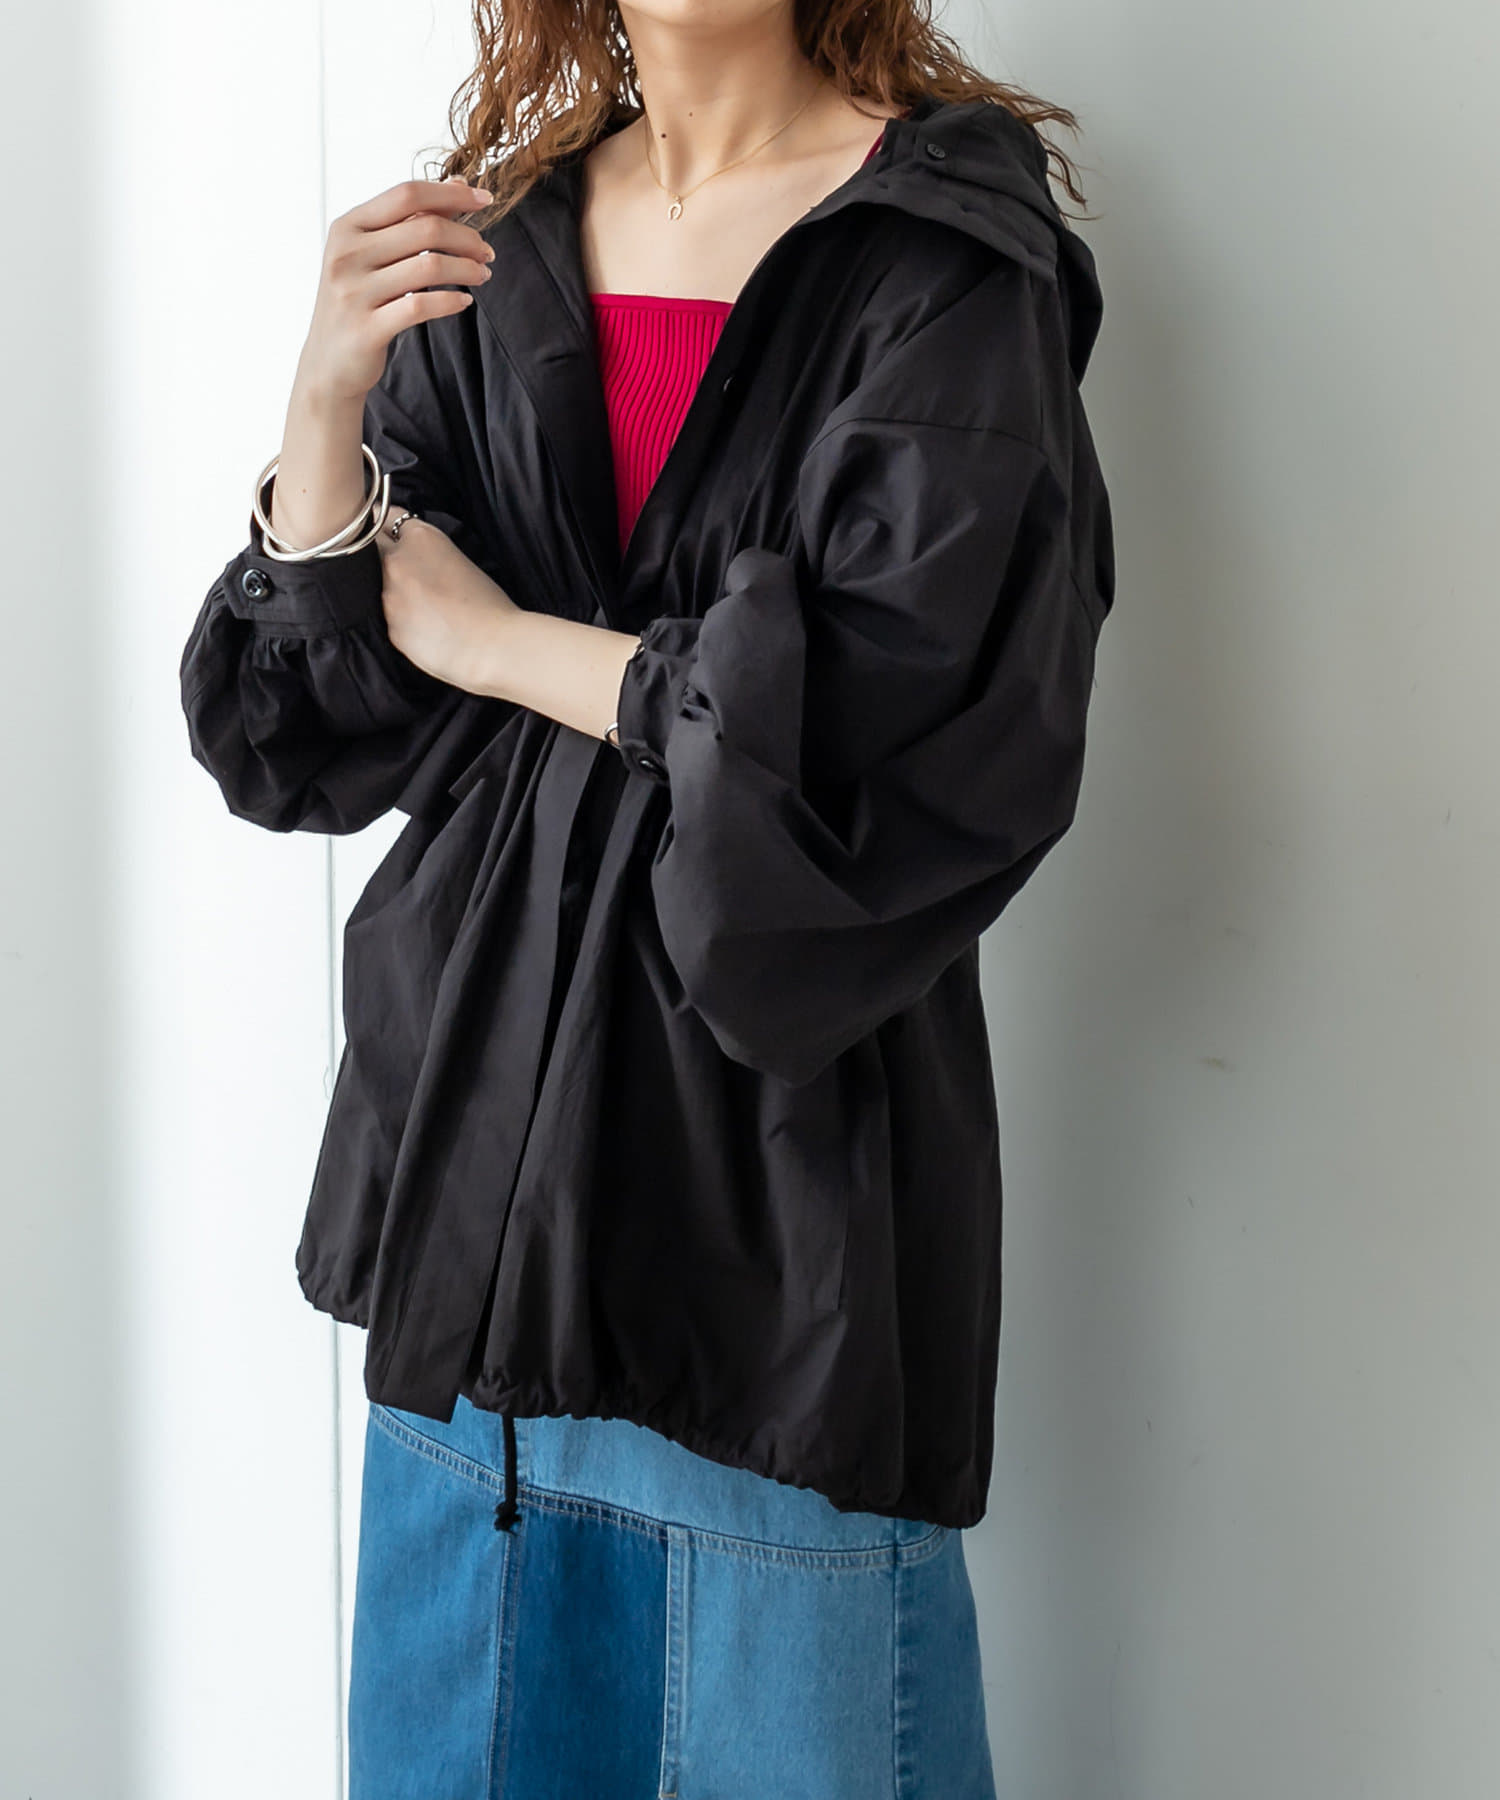 mystic(ミスティック) スノーパーカー 【着用動画あり】